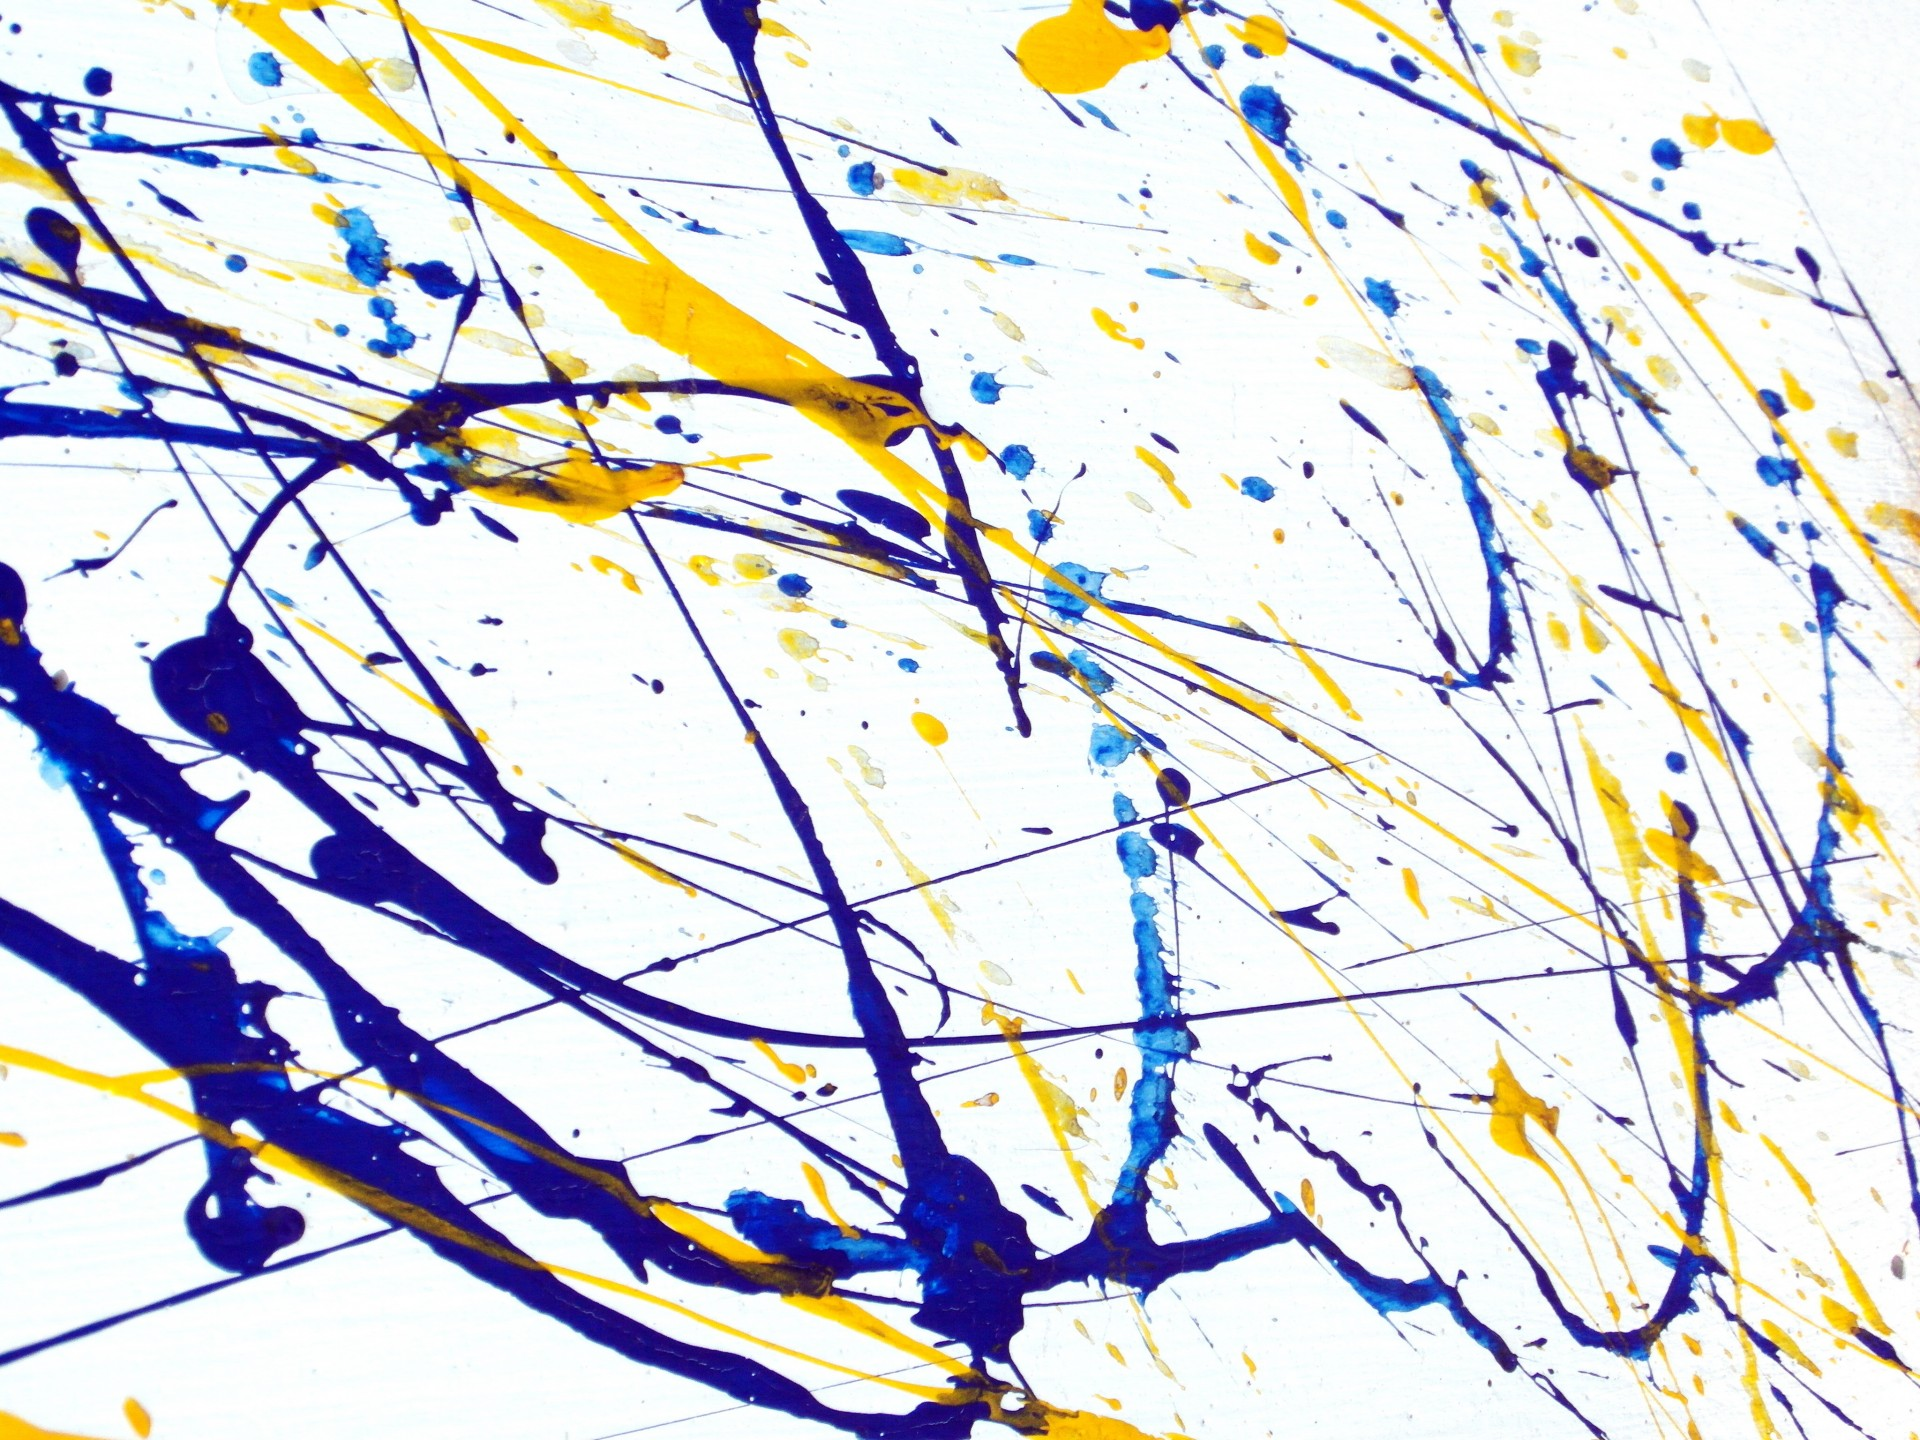 Abstract Paint Splatter Jpg